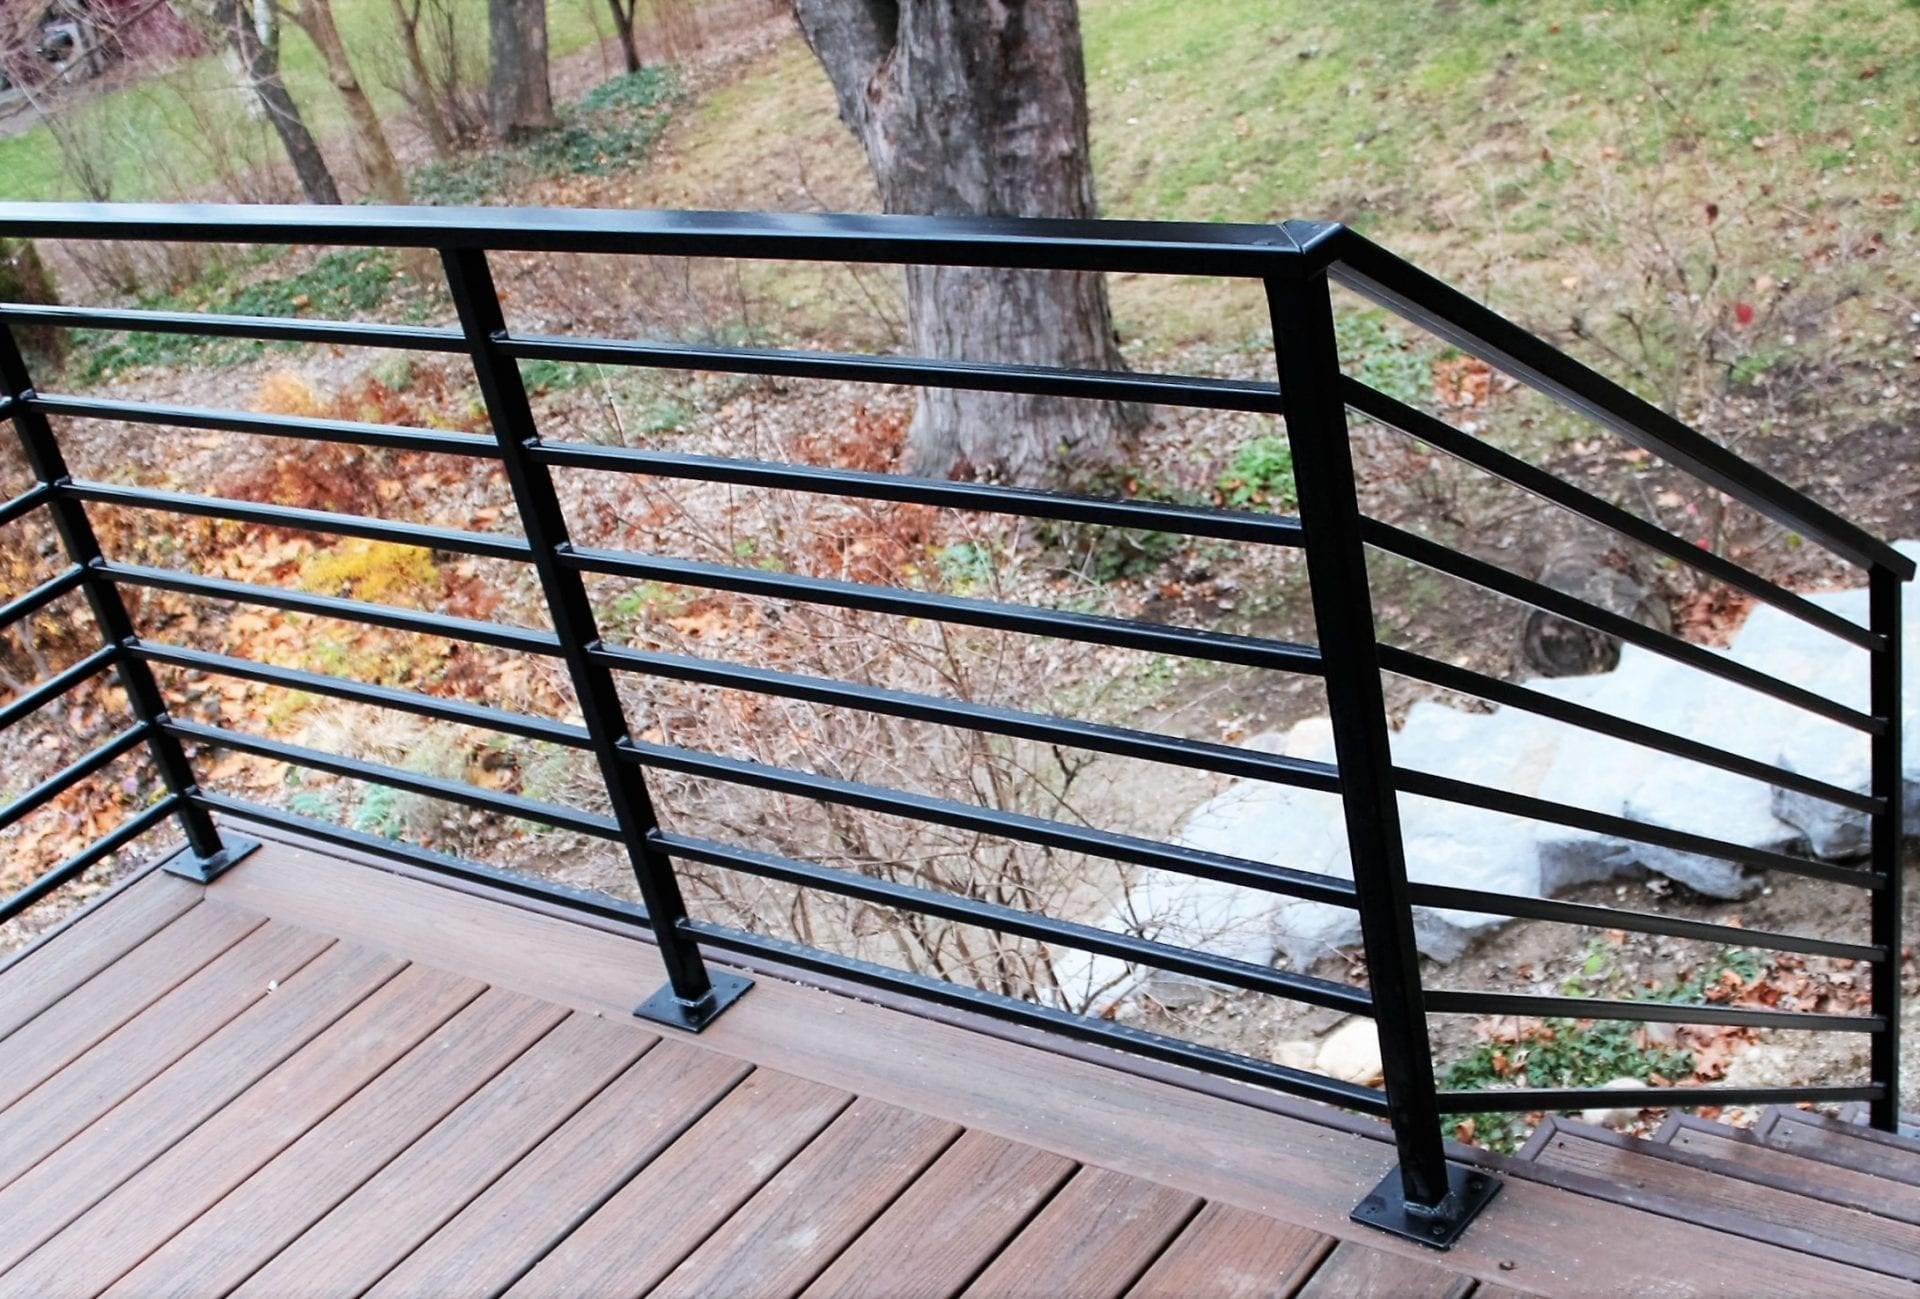 Horizontal Metal Railing For Deck Great Lakes Metal Fabrication   Horizontal Iron Stair Railing   Chris Loves   Modern   Popular   Low Cost   Remodel